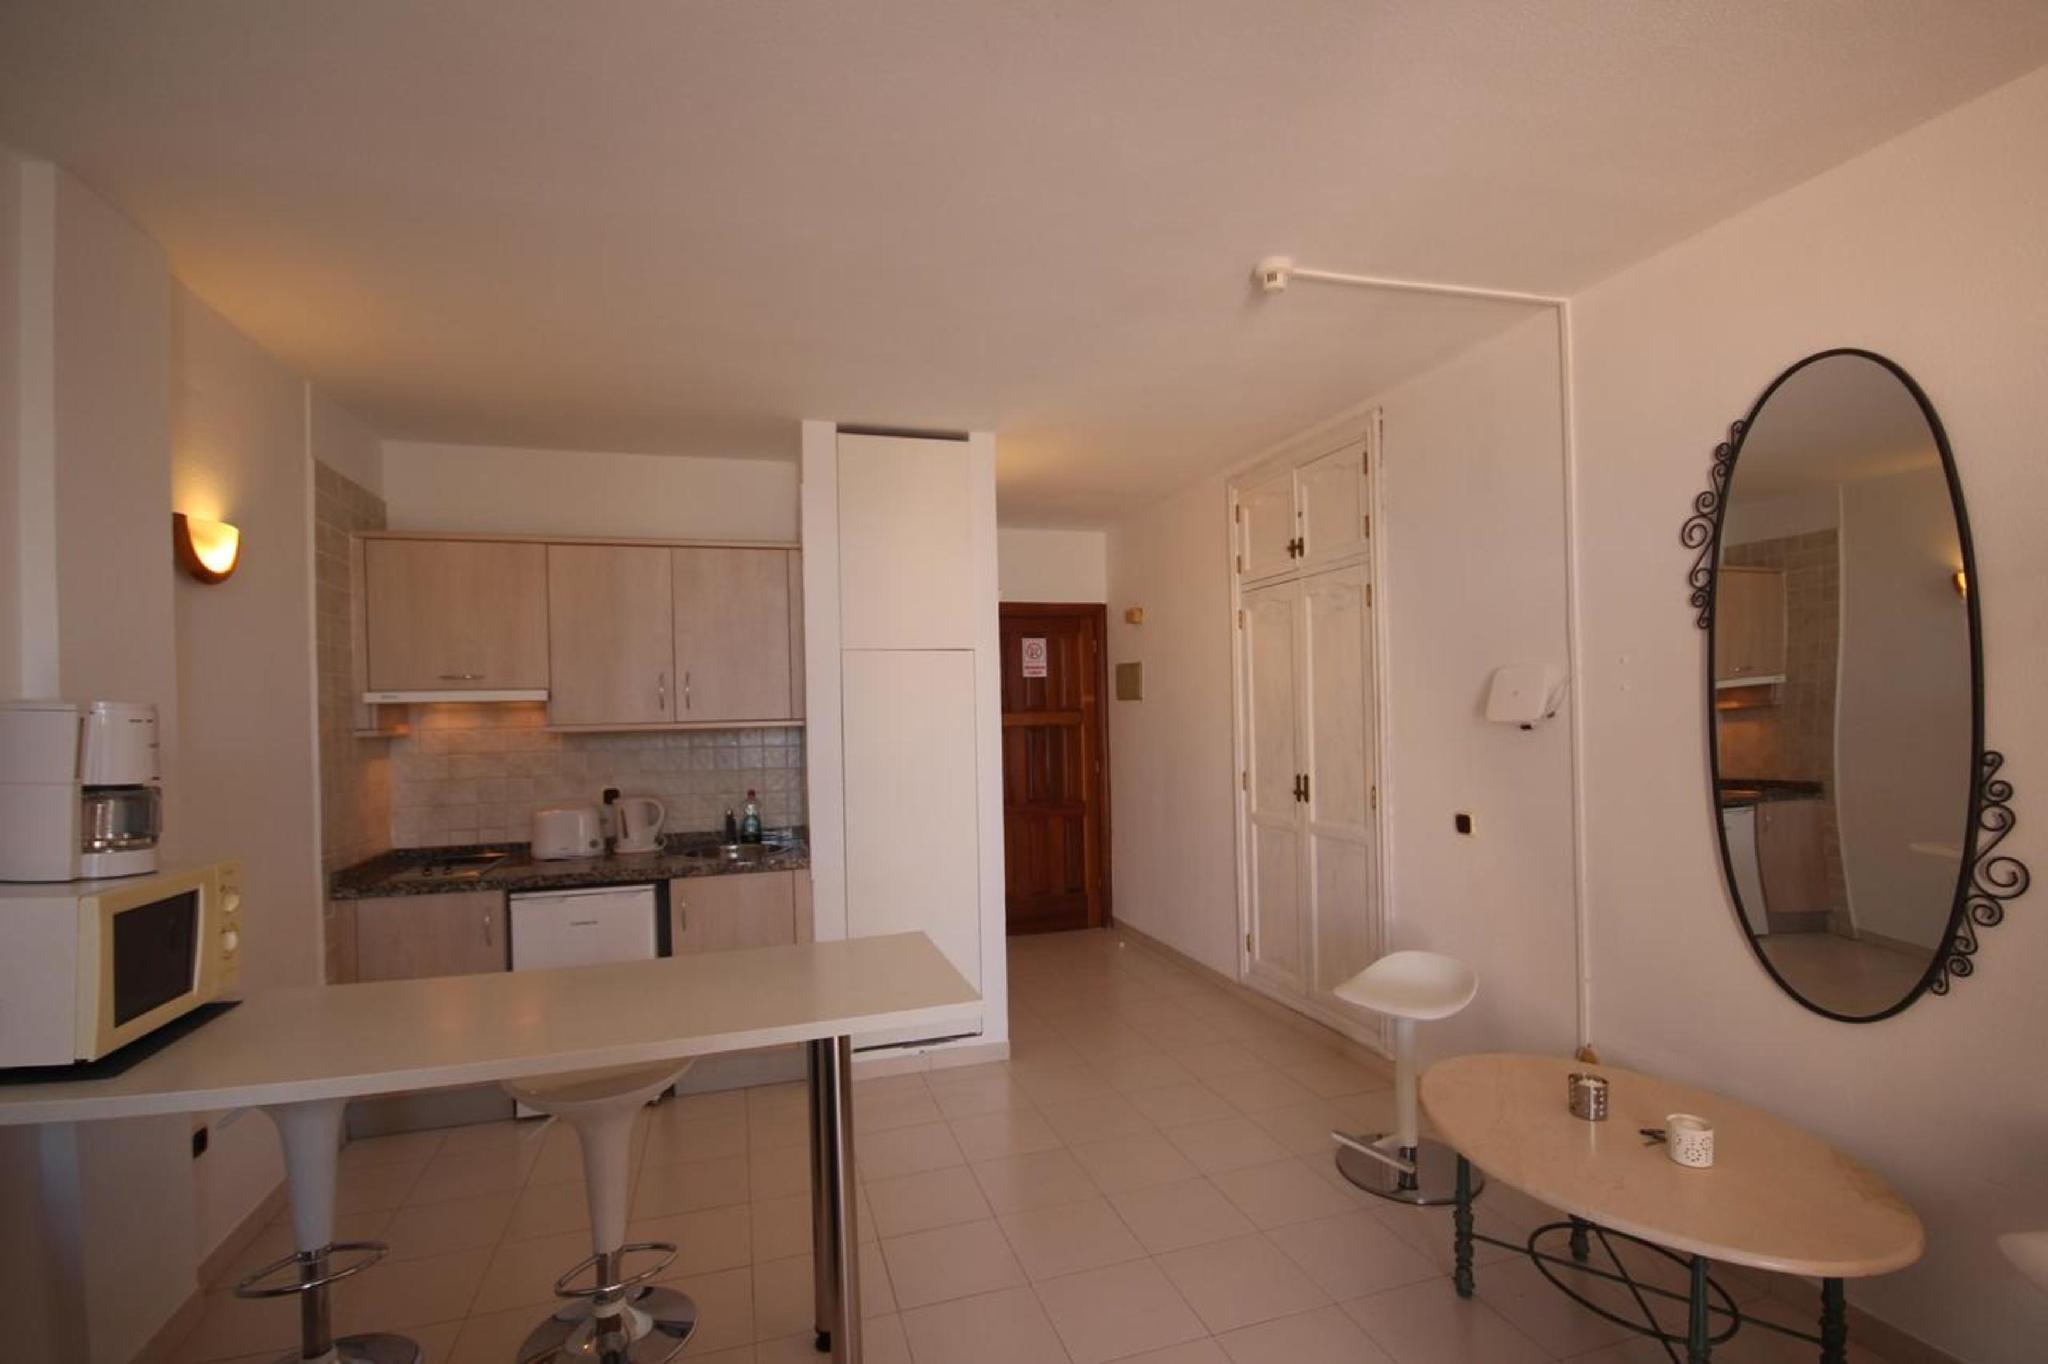 107120 - Studio in Costa Adeje